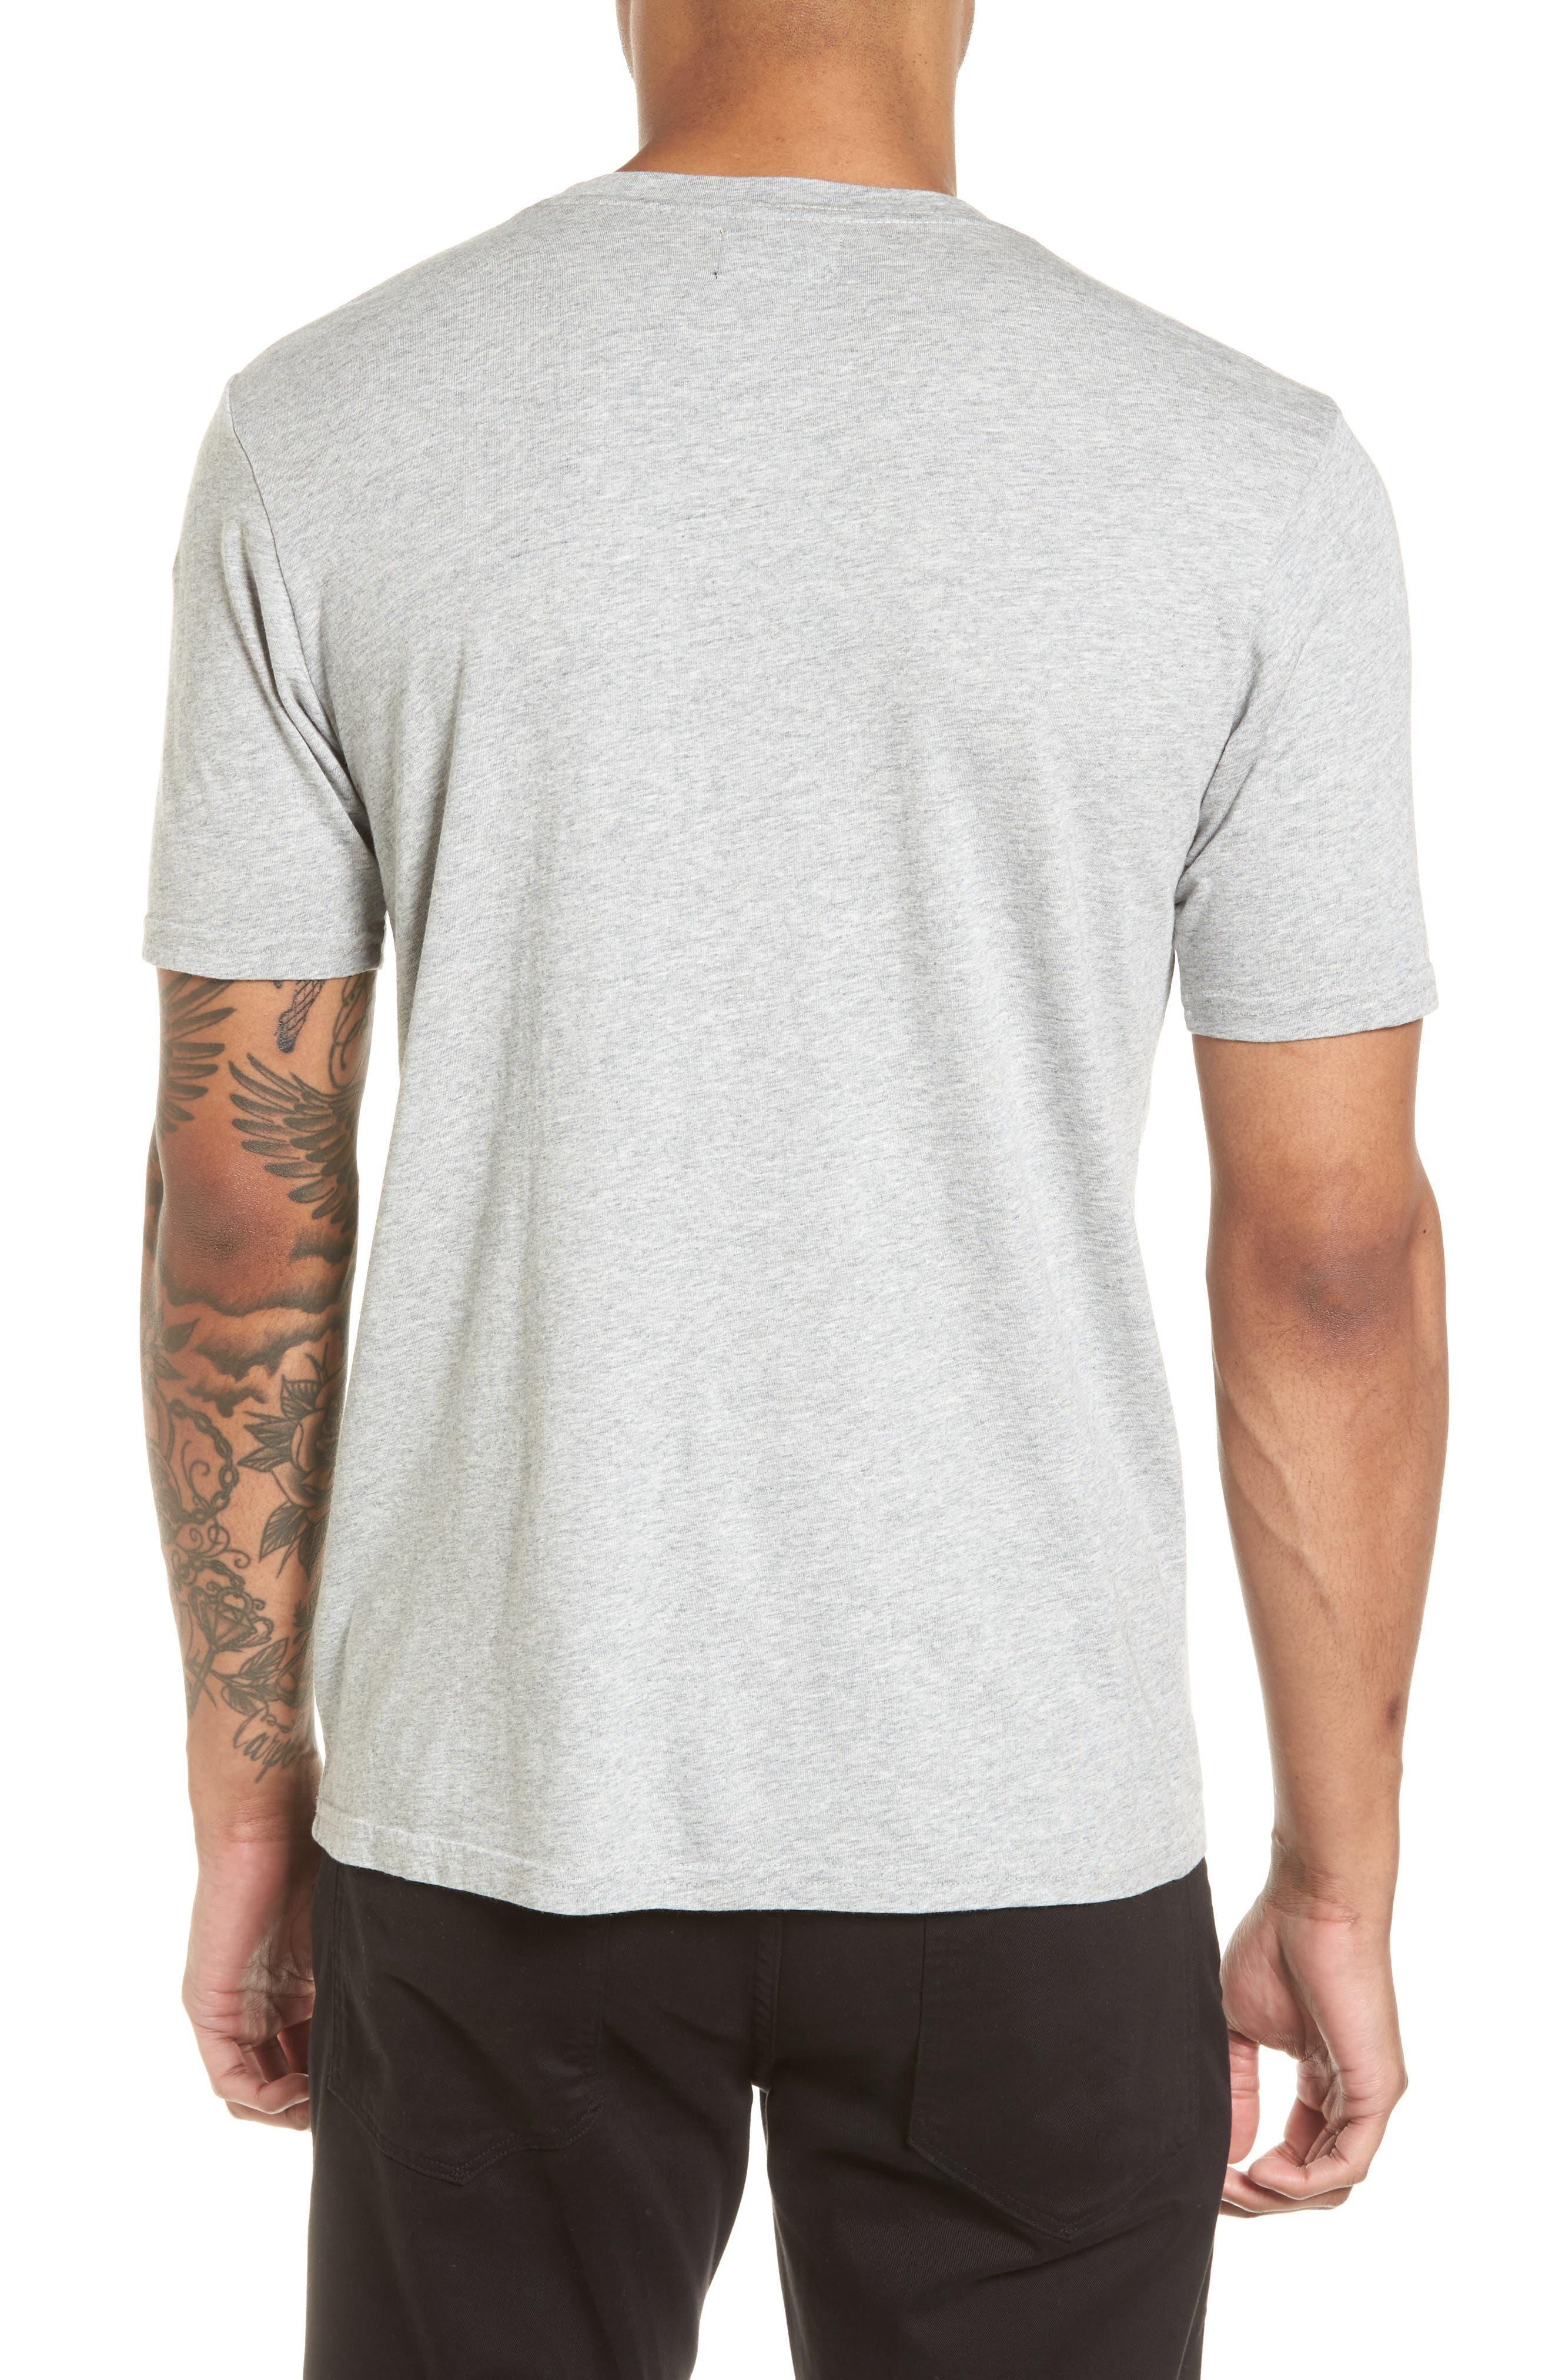 Alternate Image 2  - Goodlife Crewneck T-Shirt